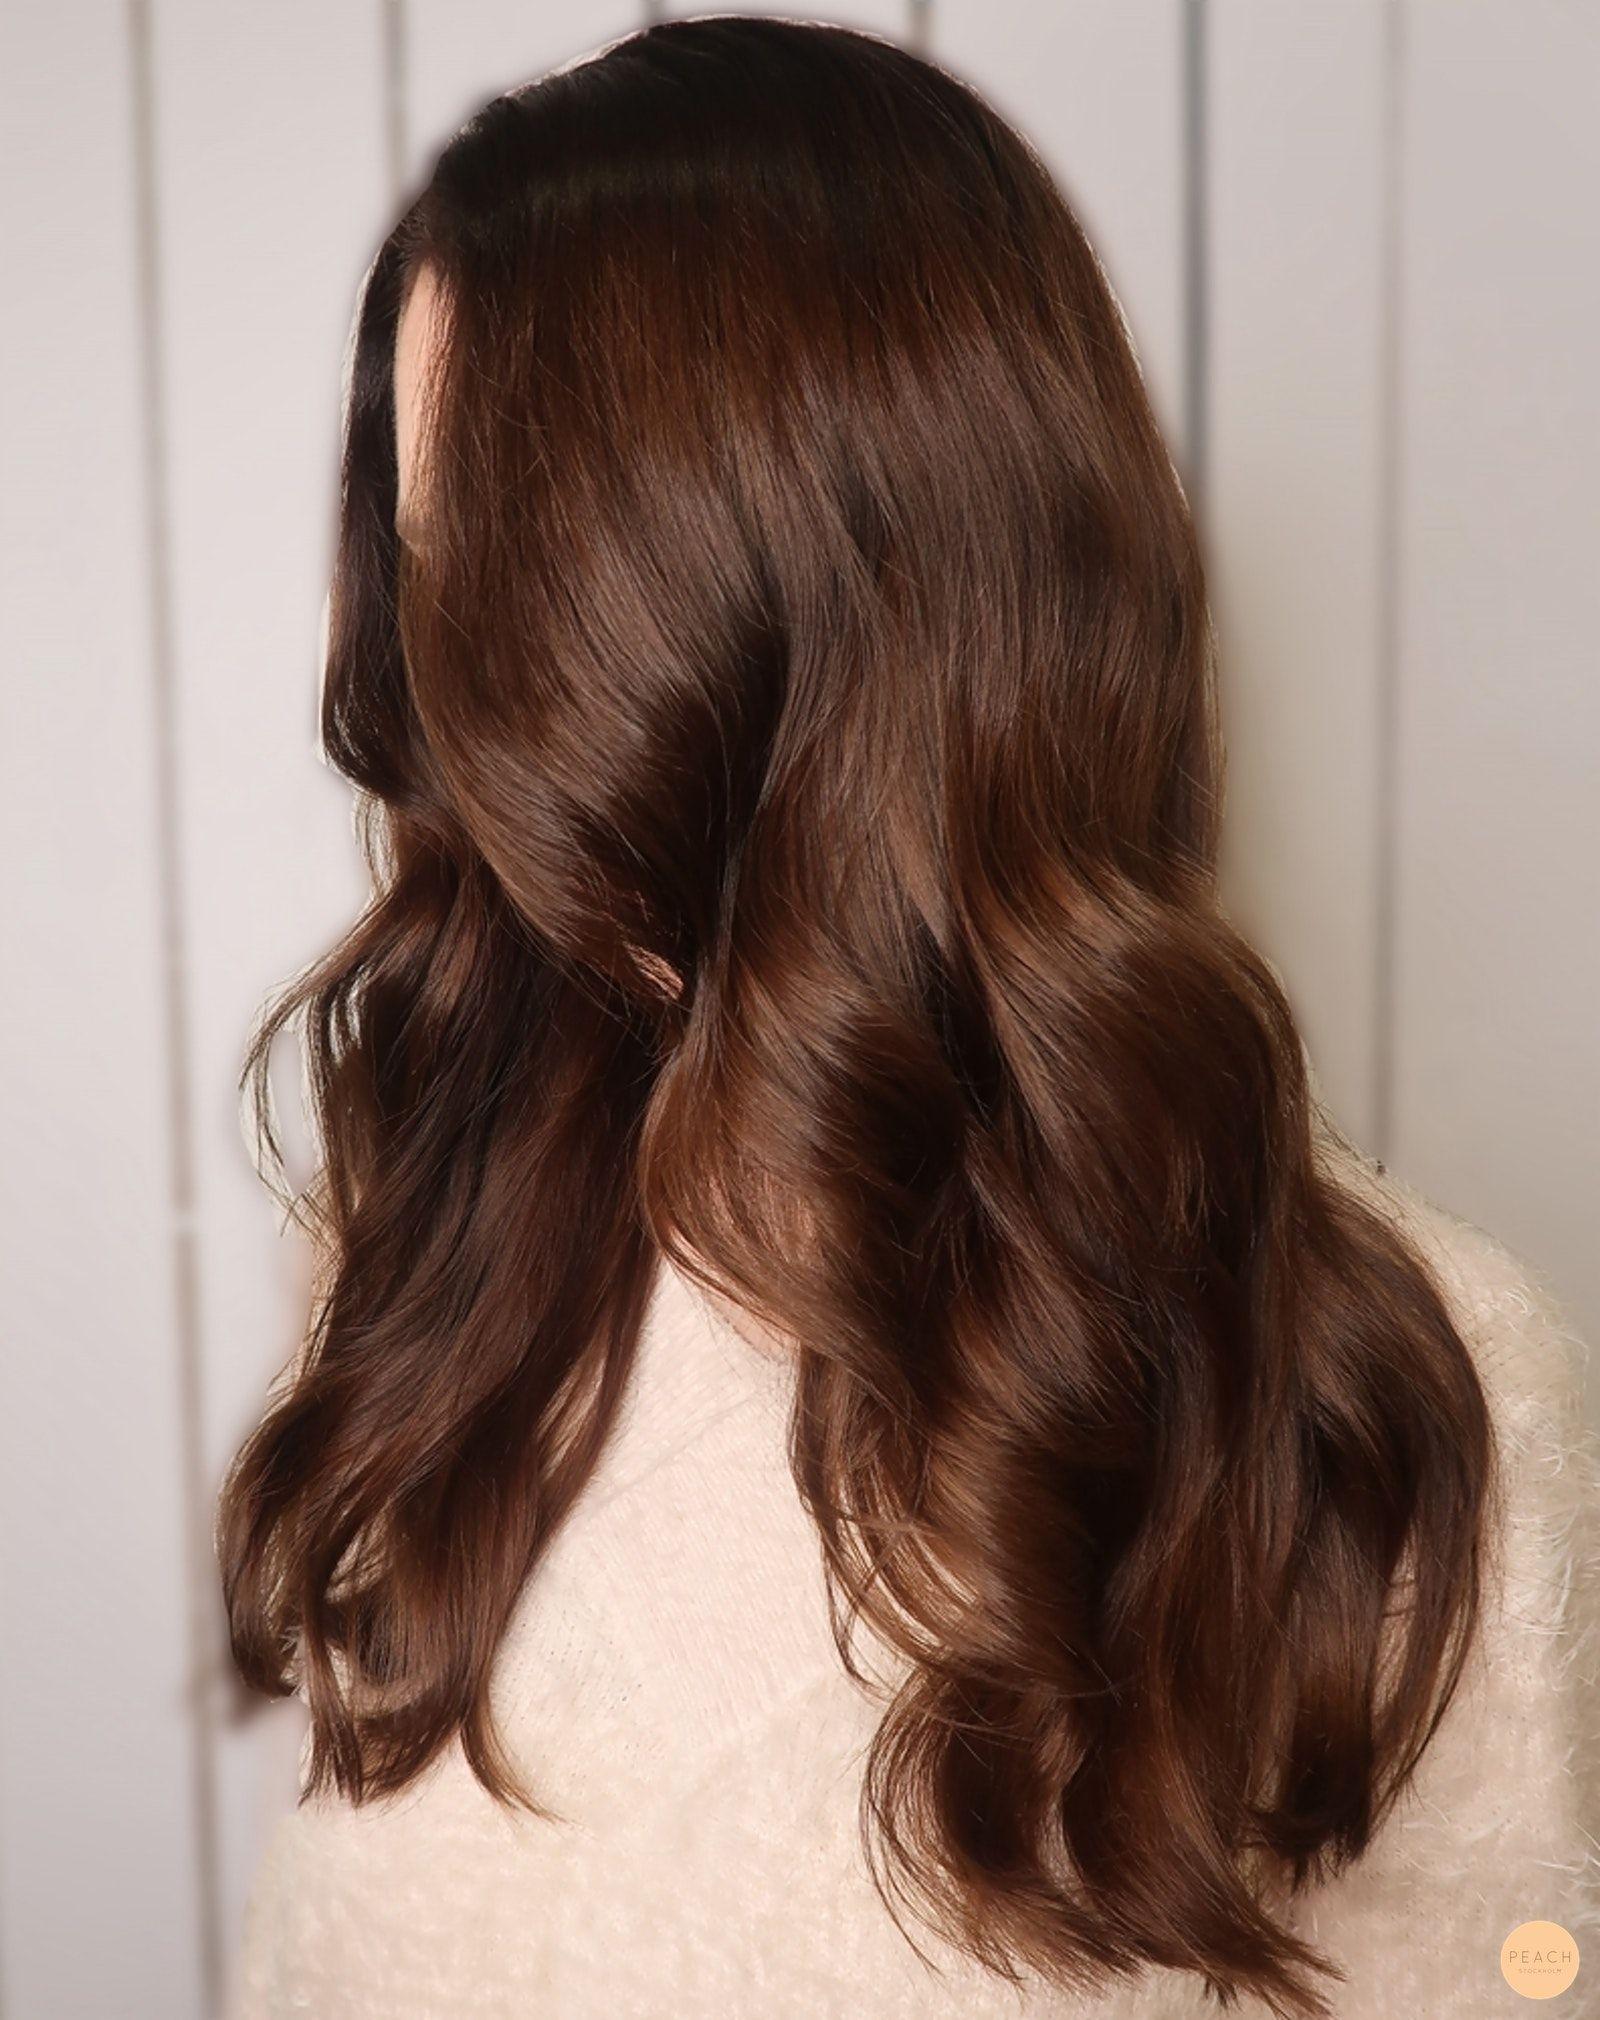 Photo of Snyggaste hårfärgen – Lyxig chokladbrun!